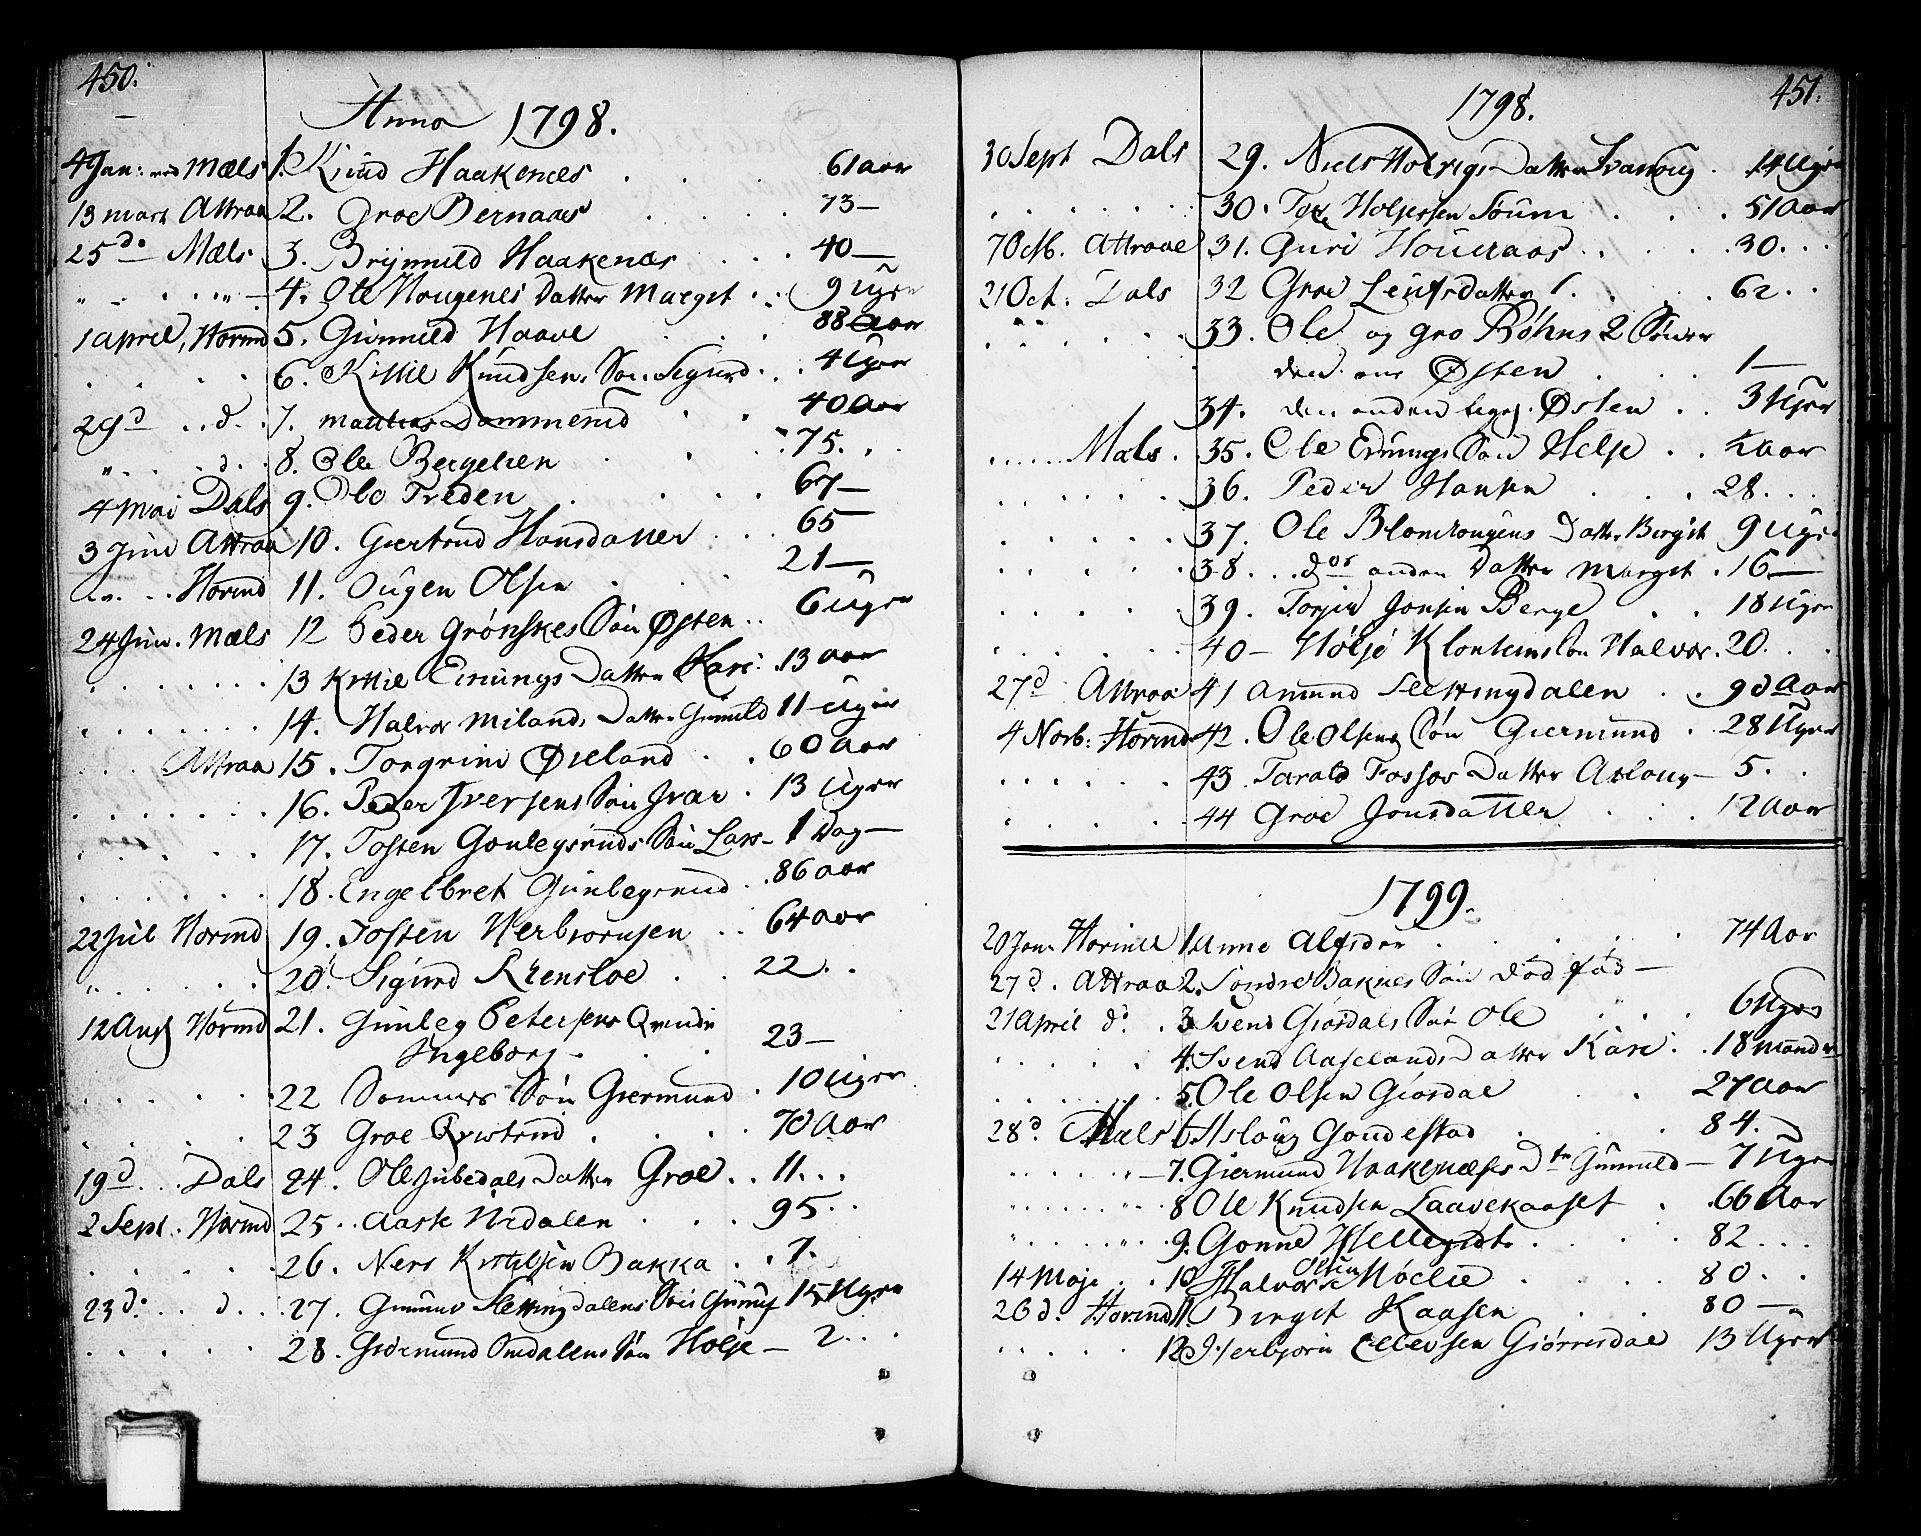 SAKO, Tinn kirkebøker, F/Fa/L0002: Ministerialbok nr. I 2, 1757-1810, s. 450-451